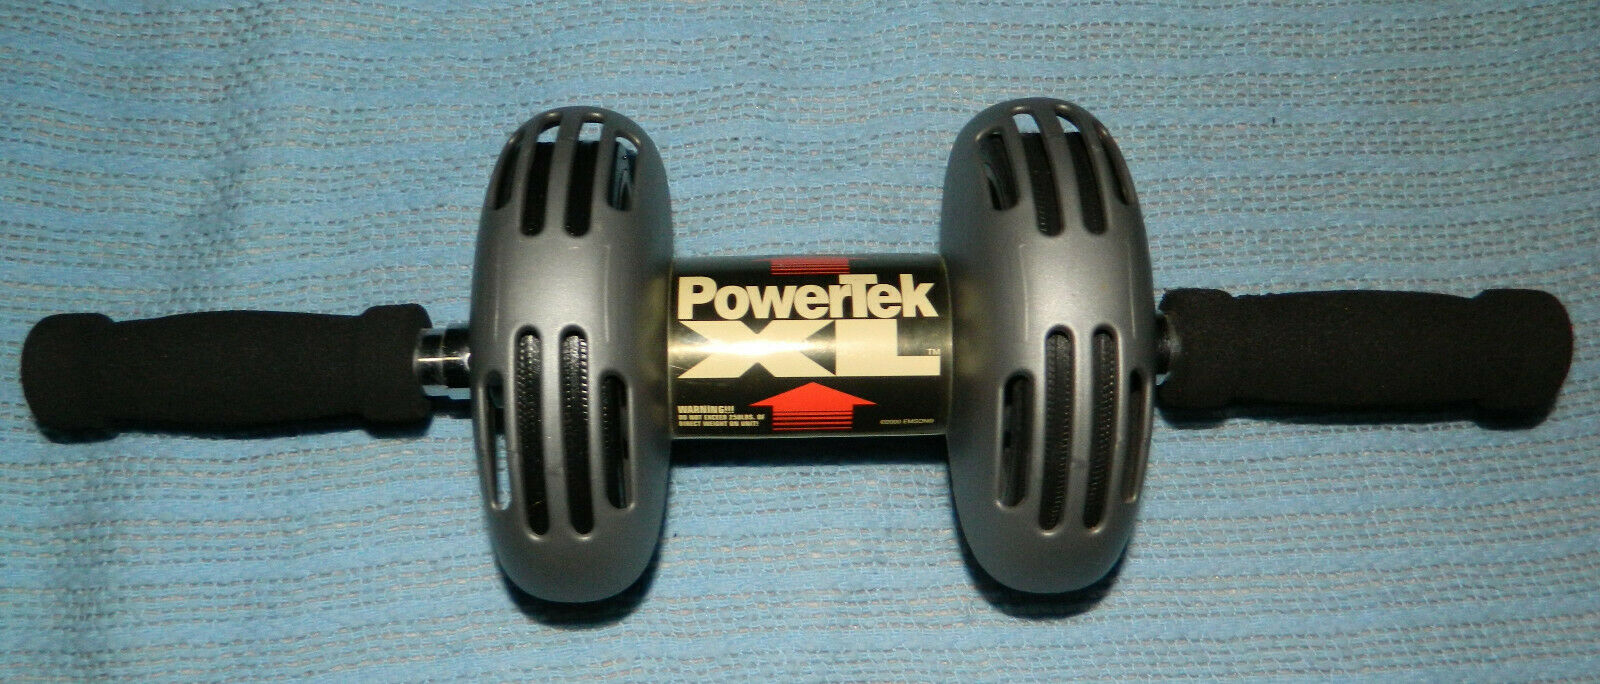 PowerTek XL   Powertek XL Brand Total Body Exerciser